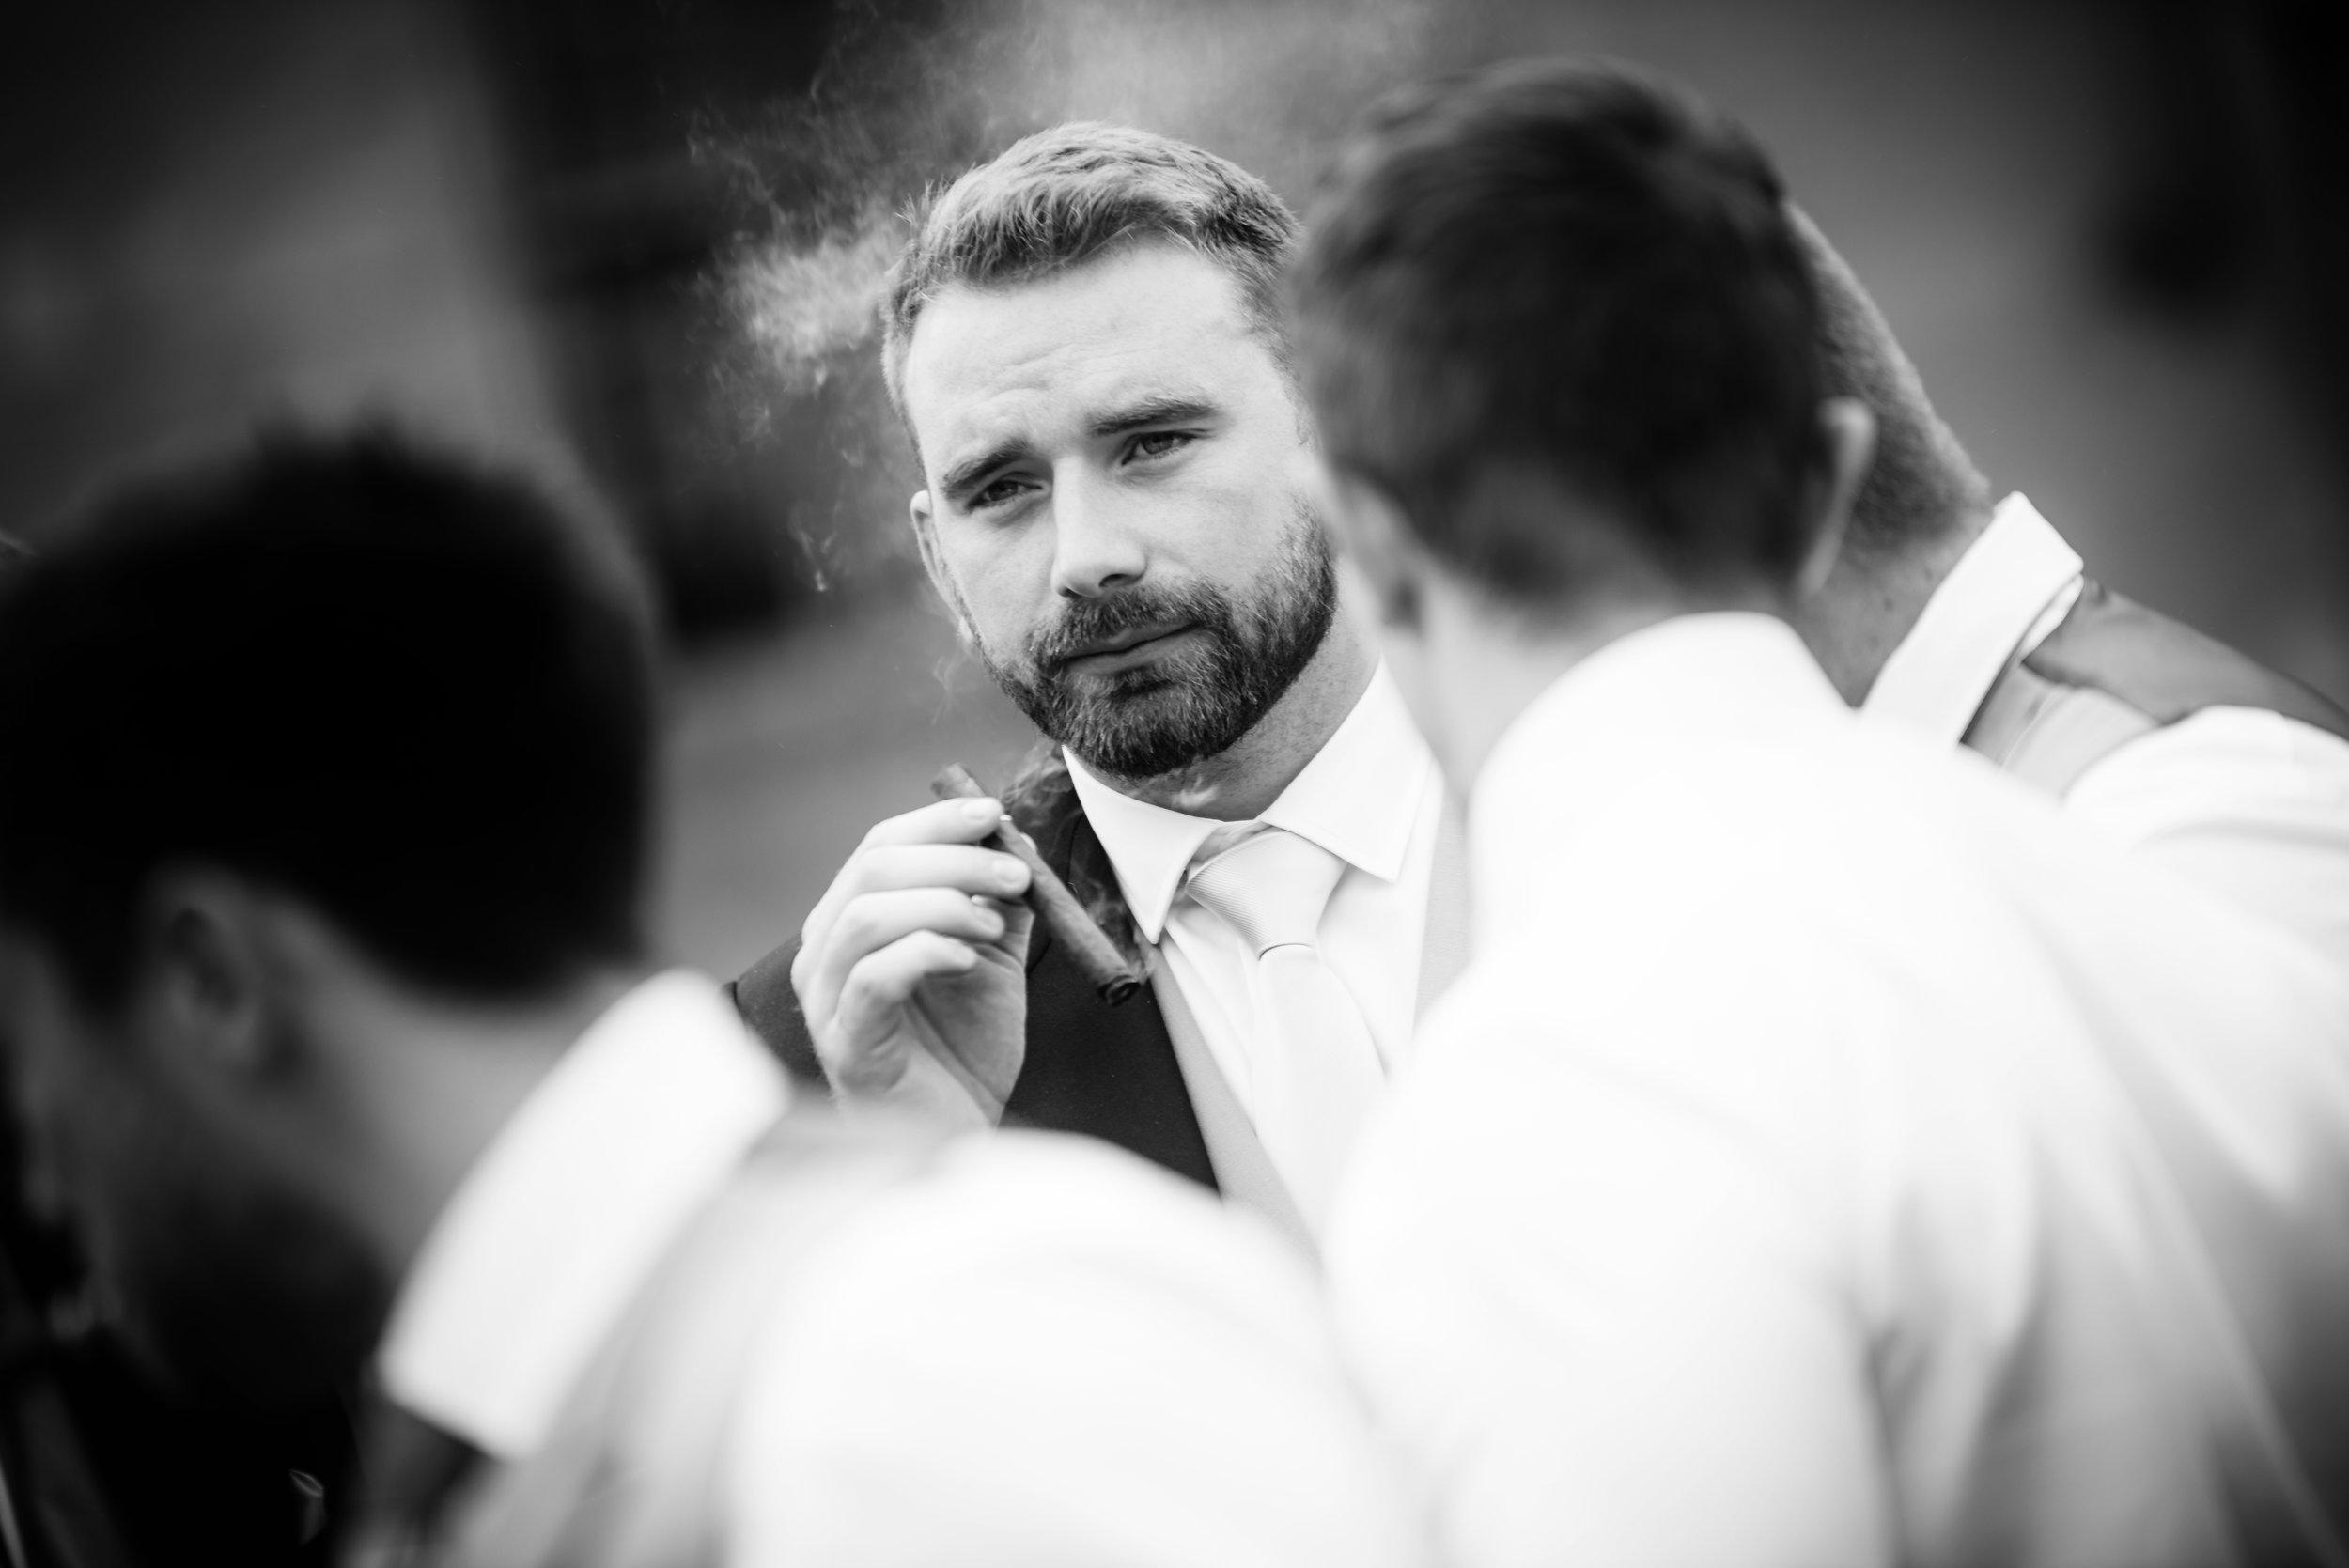 The groomsmen cigar time